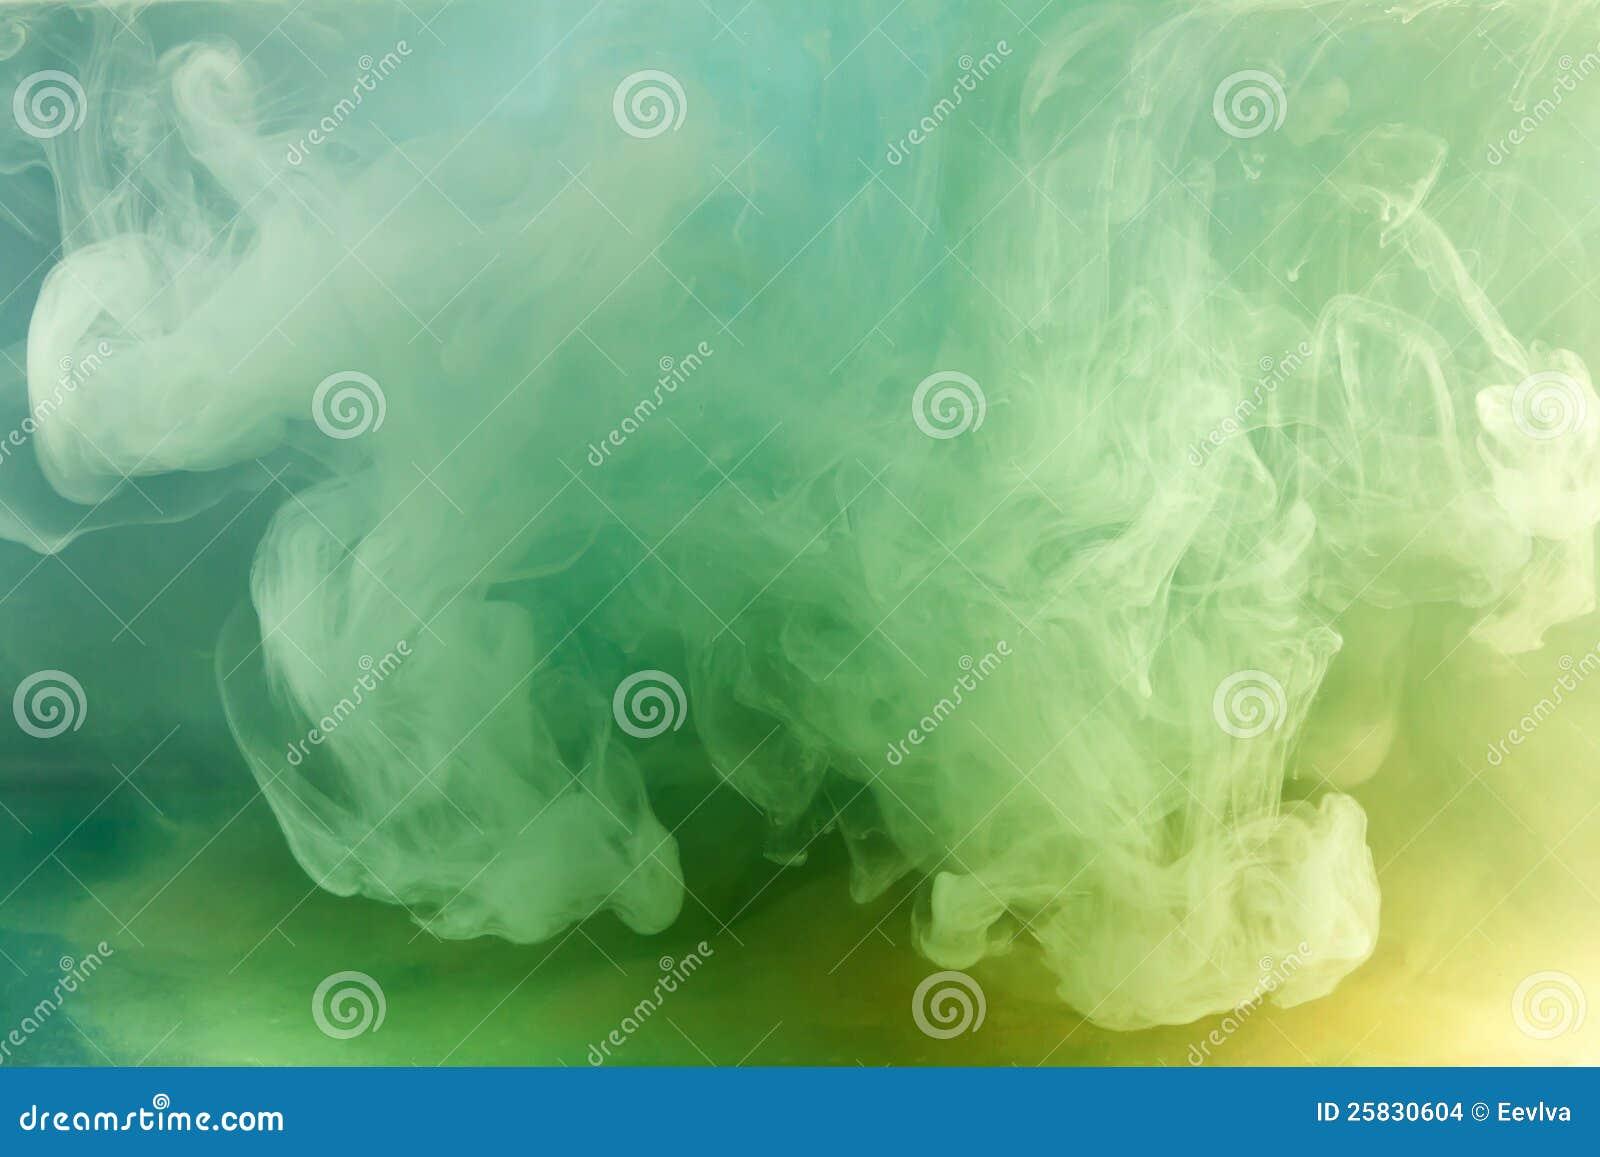 Green watercolor in water.